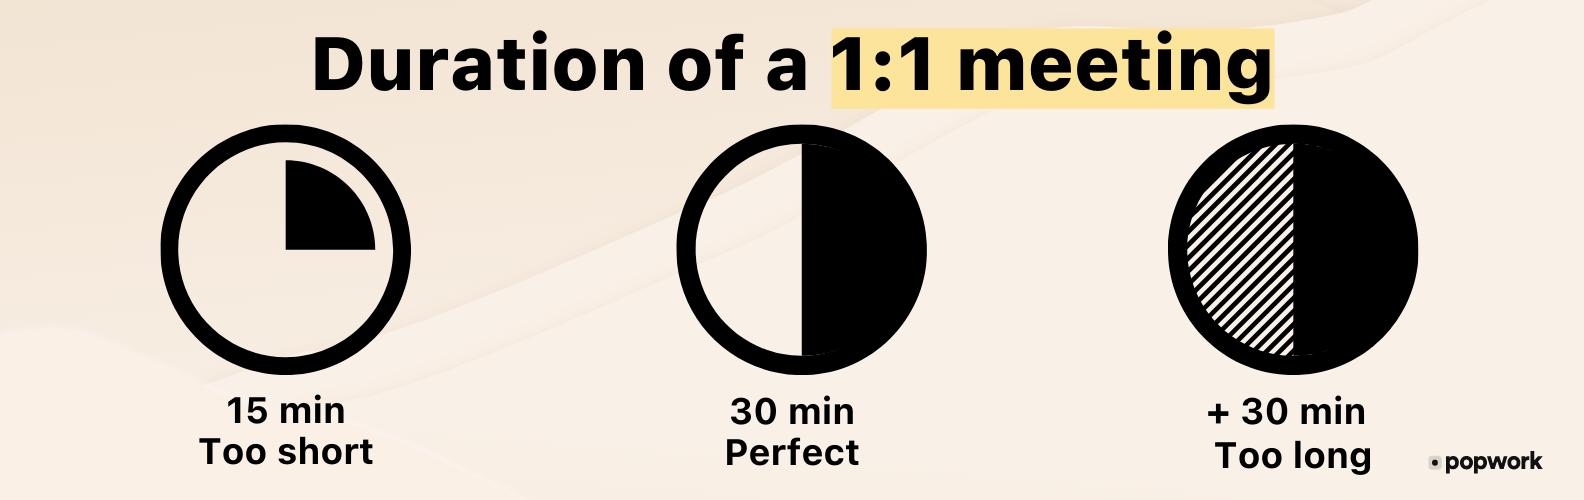 Duration of 1:1 meetings : 15 mins too short, 30 mins perfect, +30 mins too long - Popwork